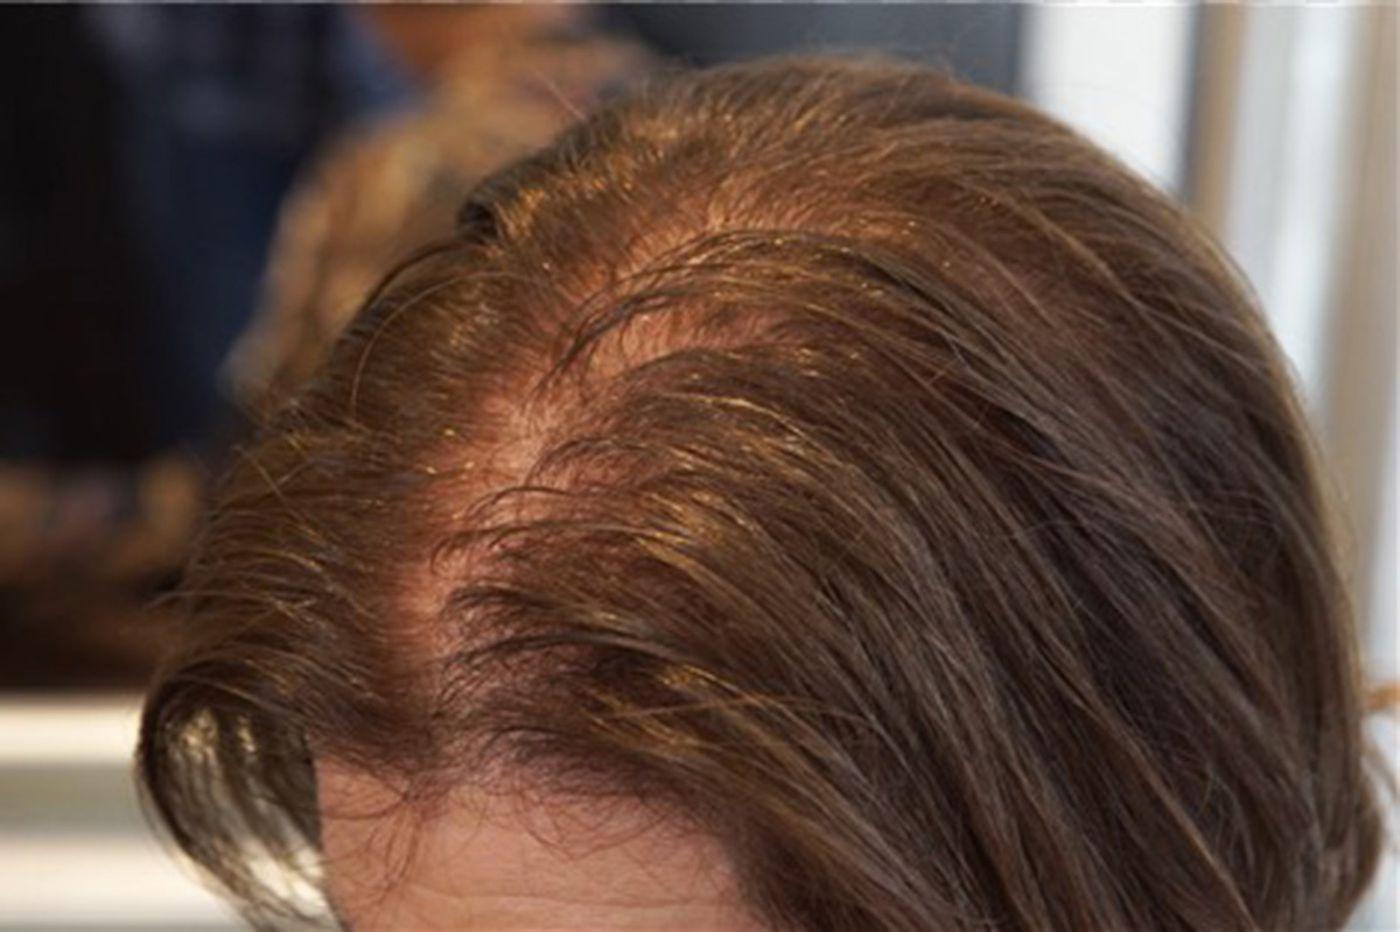 hair loss in women5.jpg